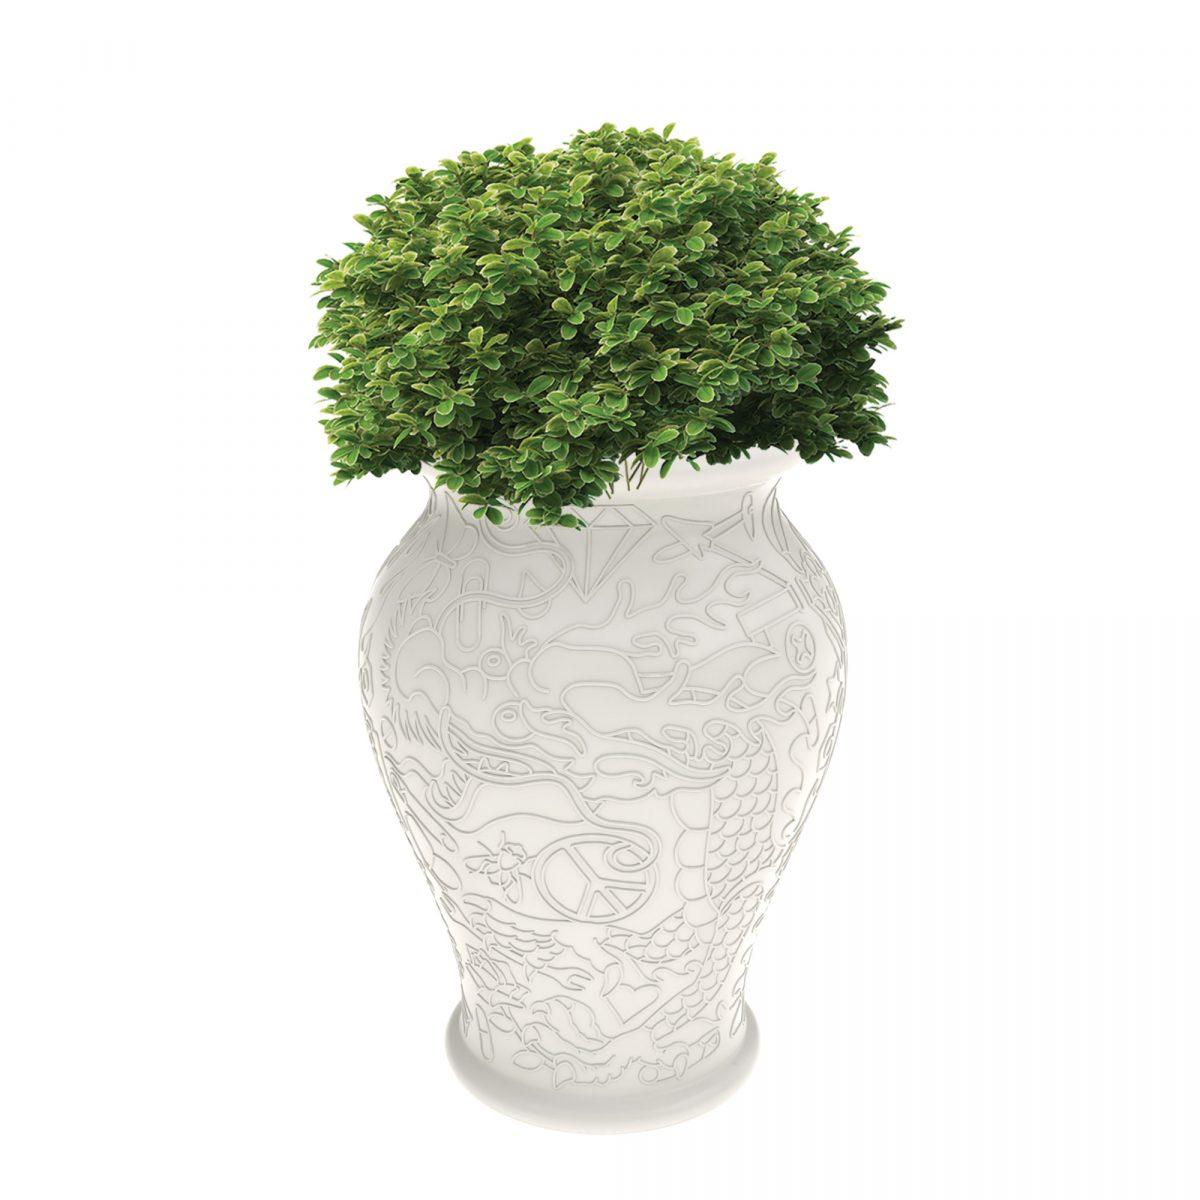 Qeeboo Ming Decoratie Vase Dutch Design Vaas Plantenbak Wit